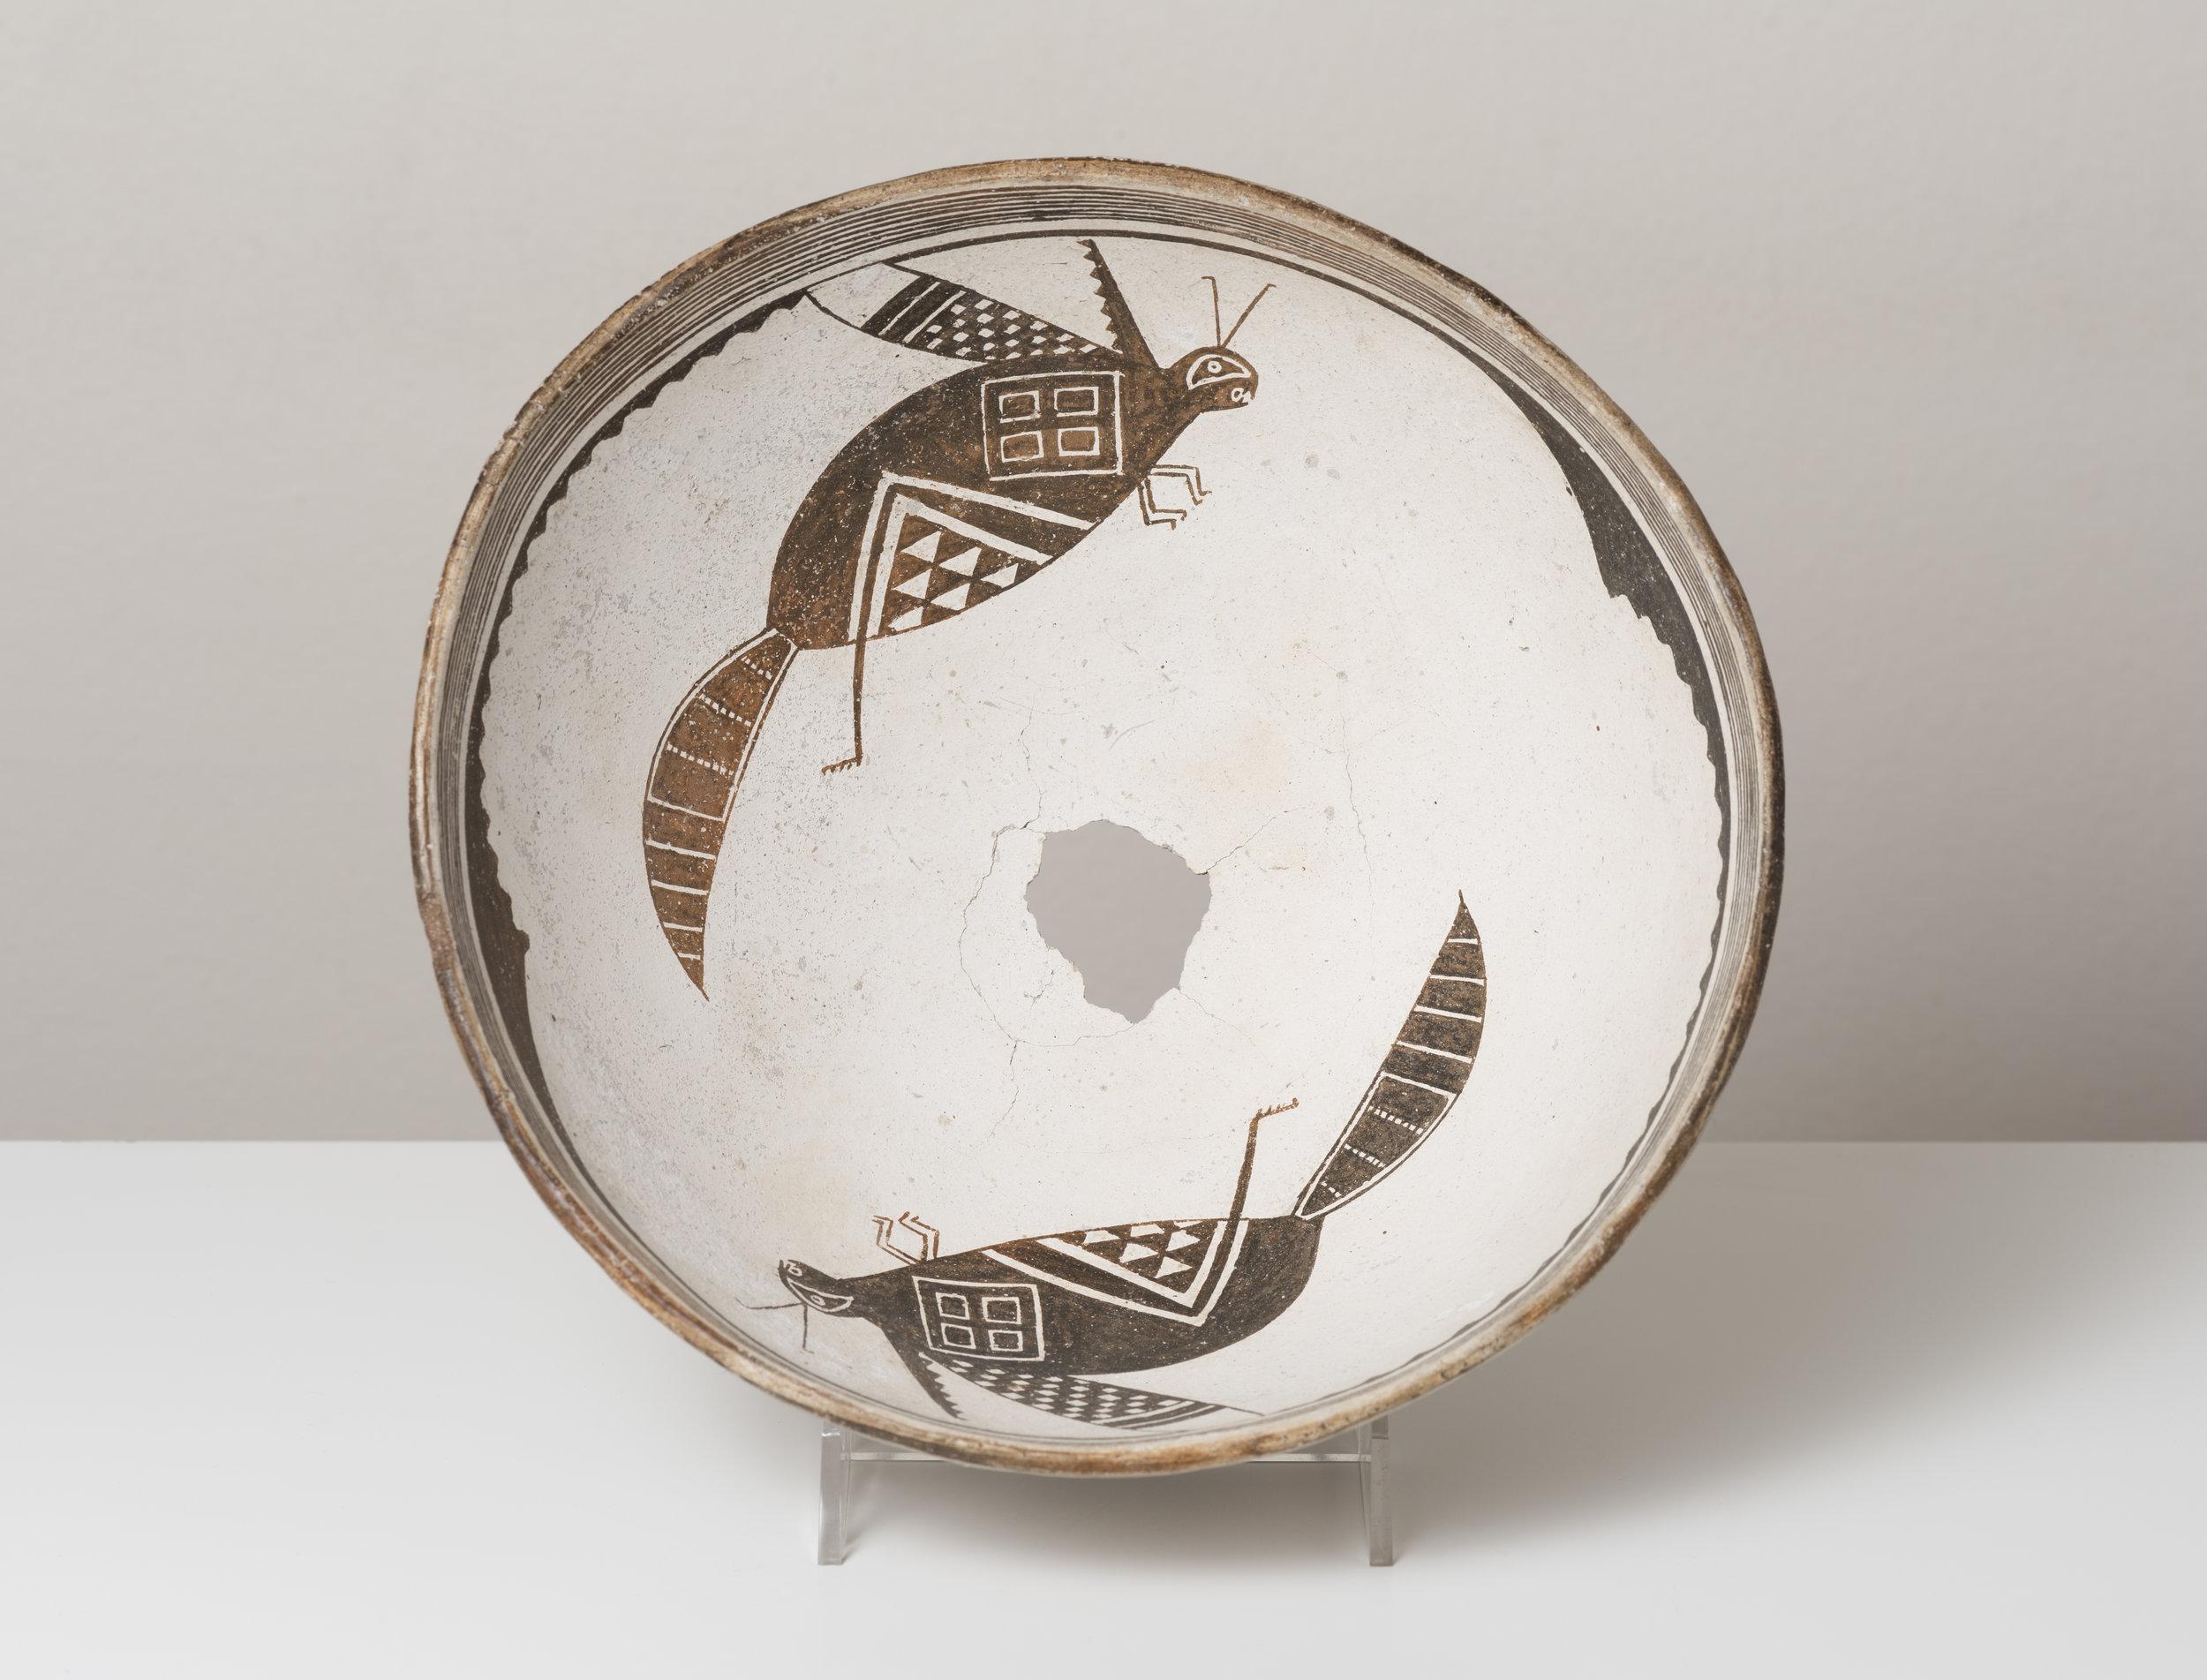 Classic Mimbres Black-on-White  c. 900-1000 CE painted ceramic 9.5 inches diameter, 5 inches depth